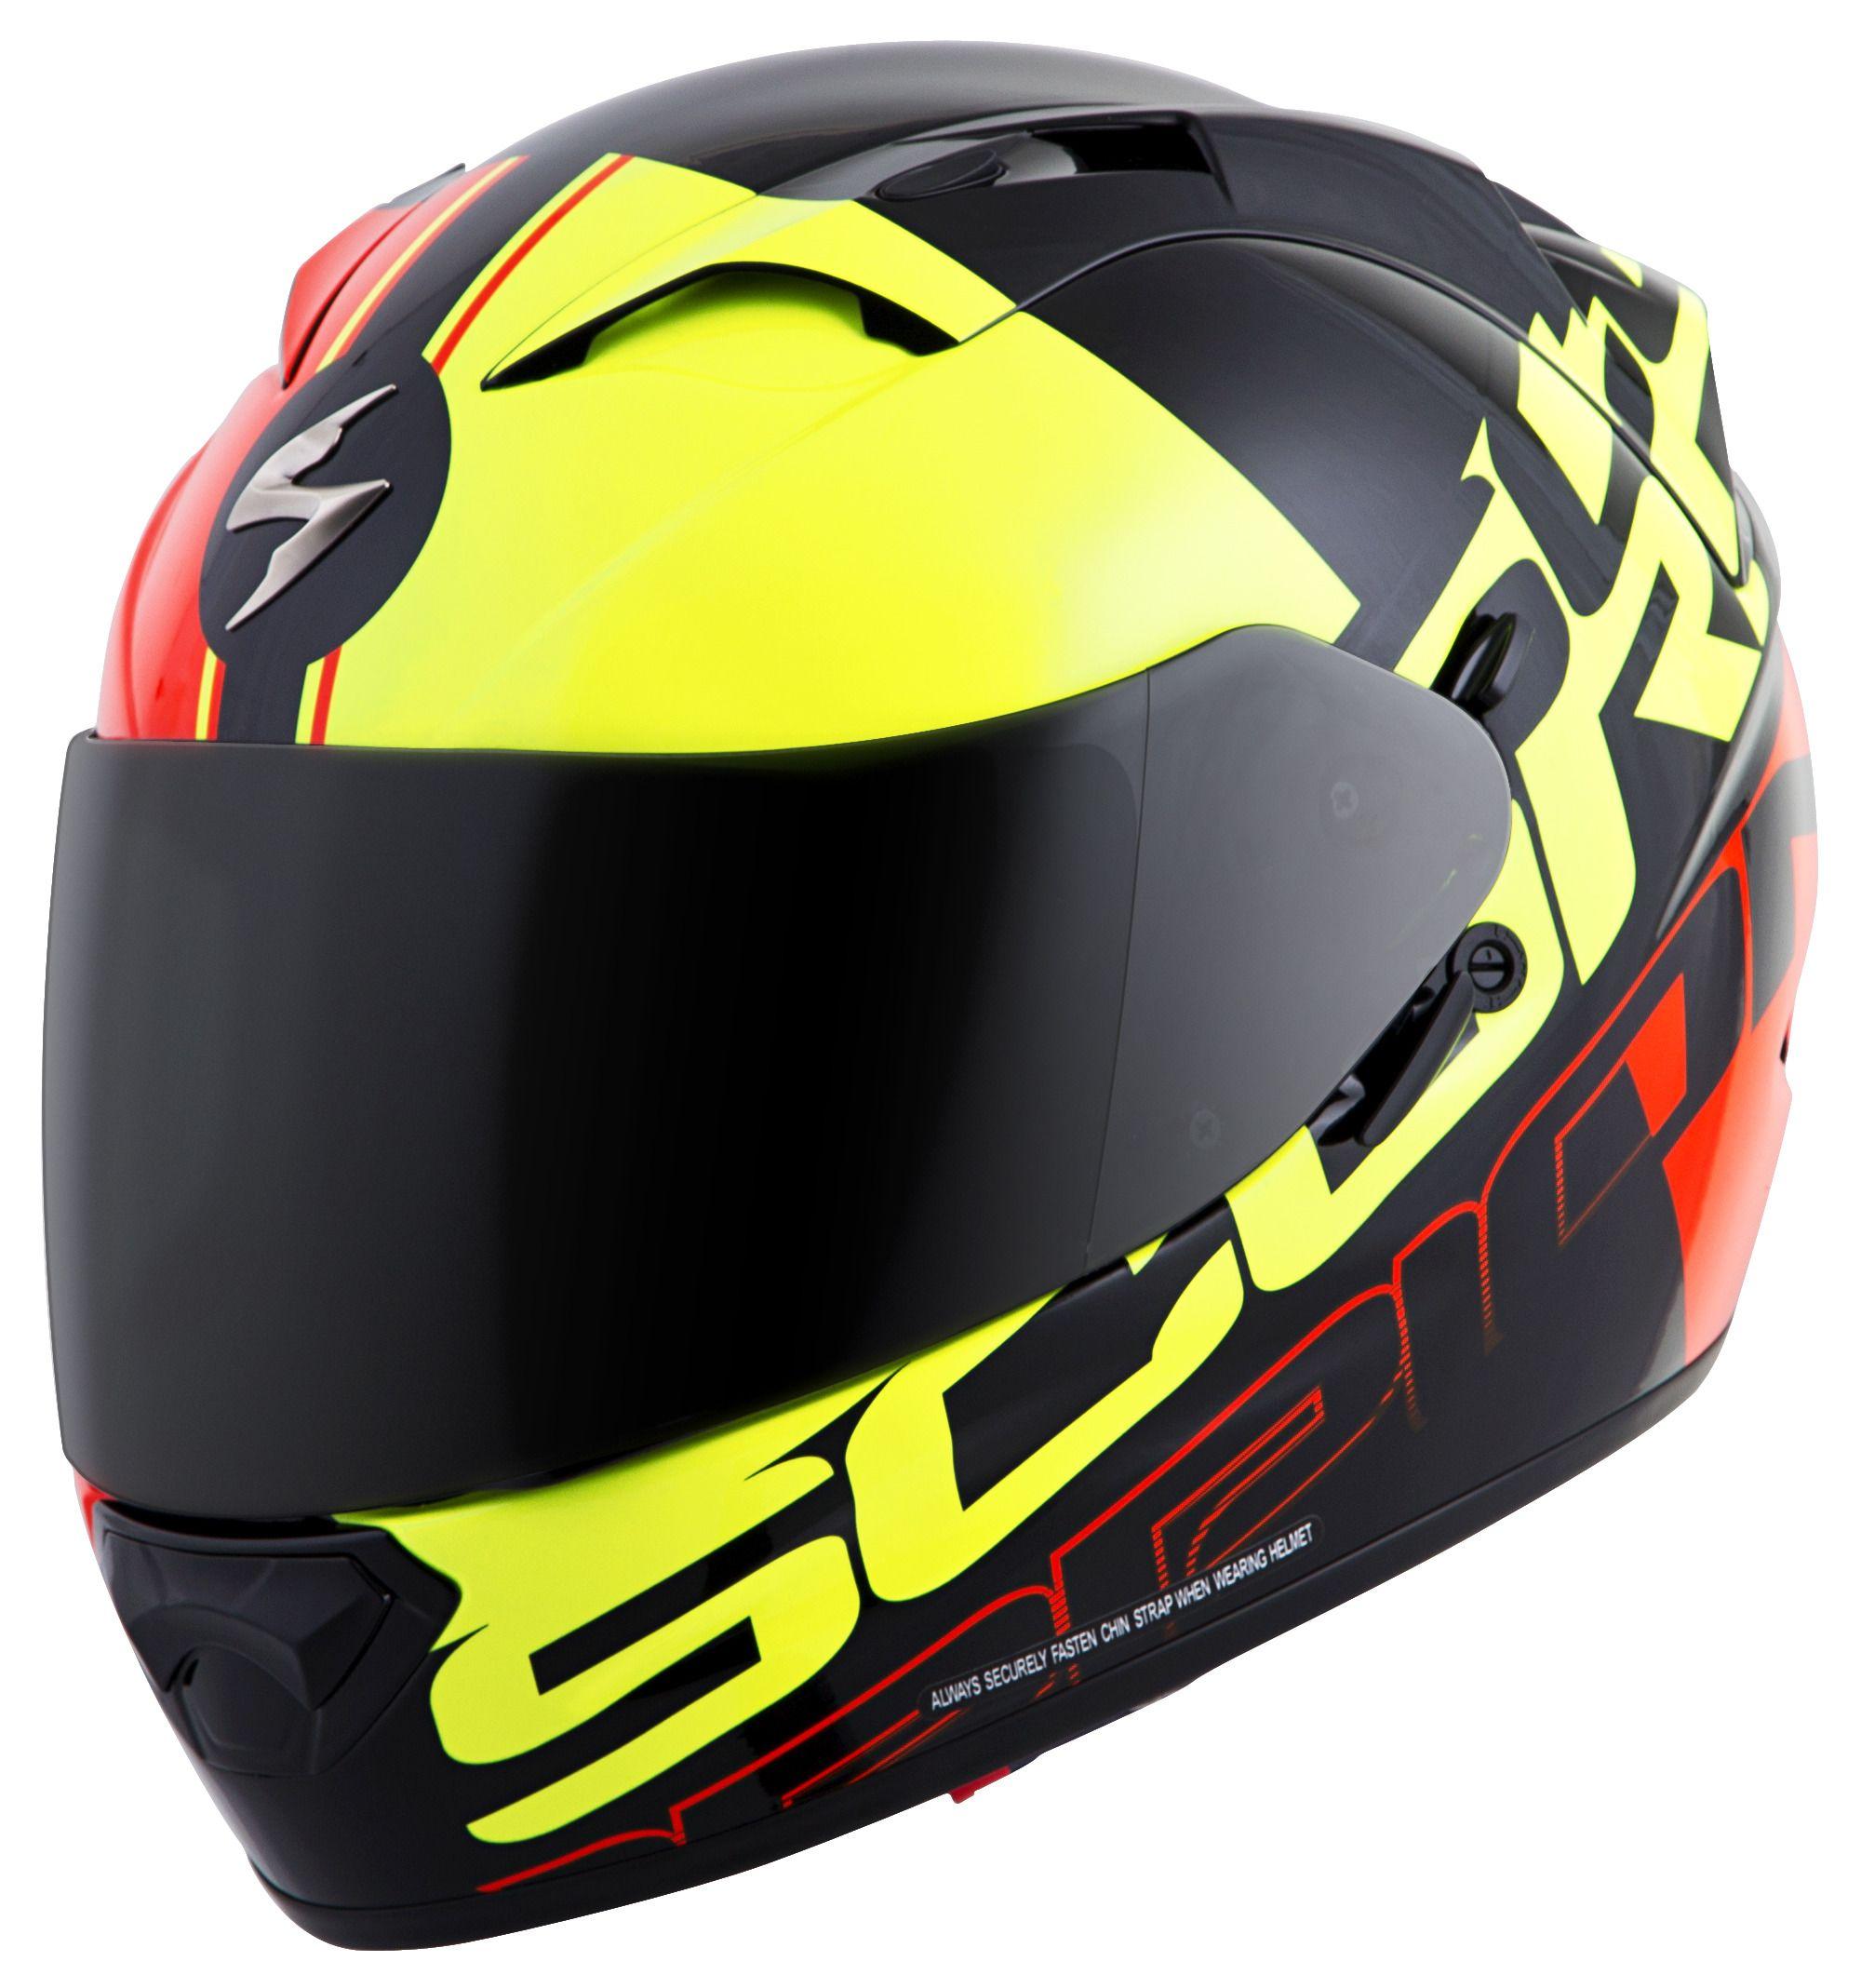 scorpion exo t1200 quattro helmet revzilla. Black Bedroom Furniture Sets. Home Design Ideas